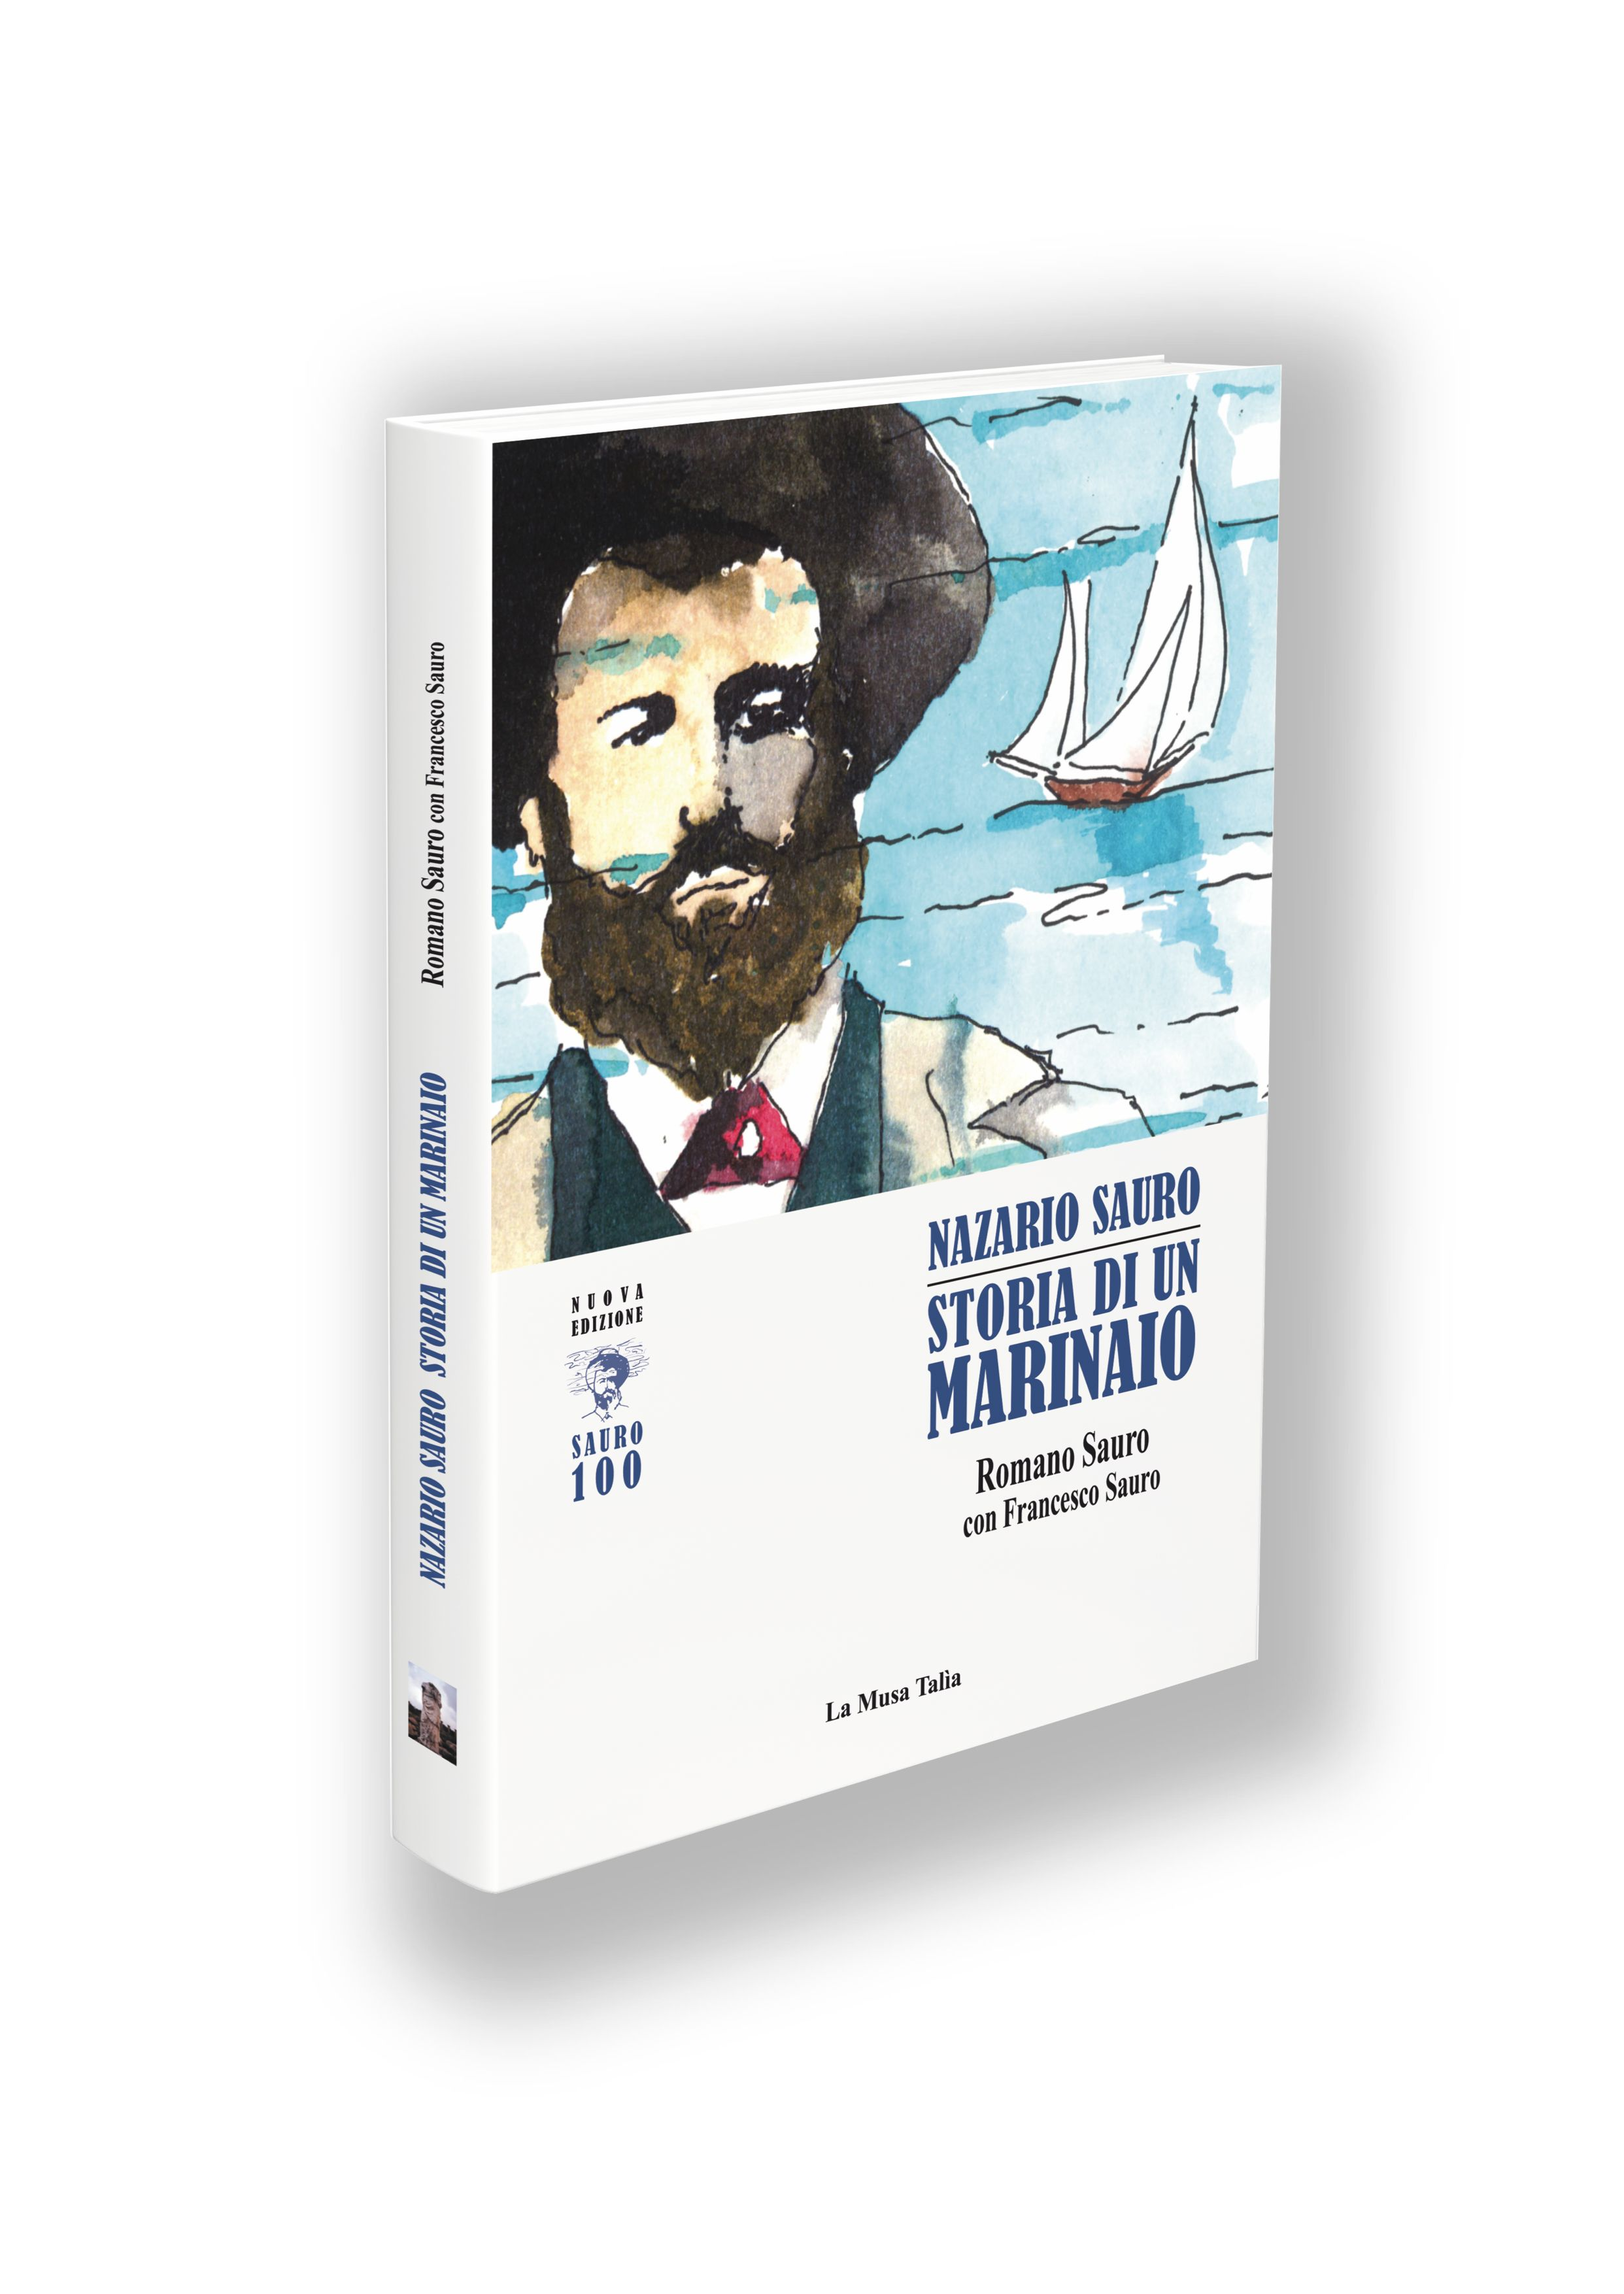 Nazzario Sauro storia di un marinaio